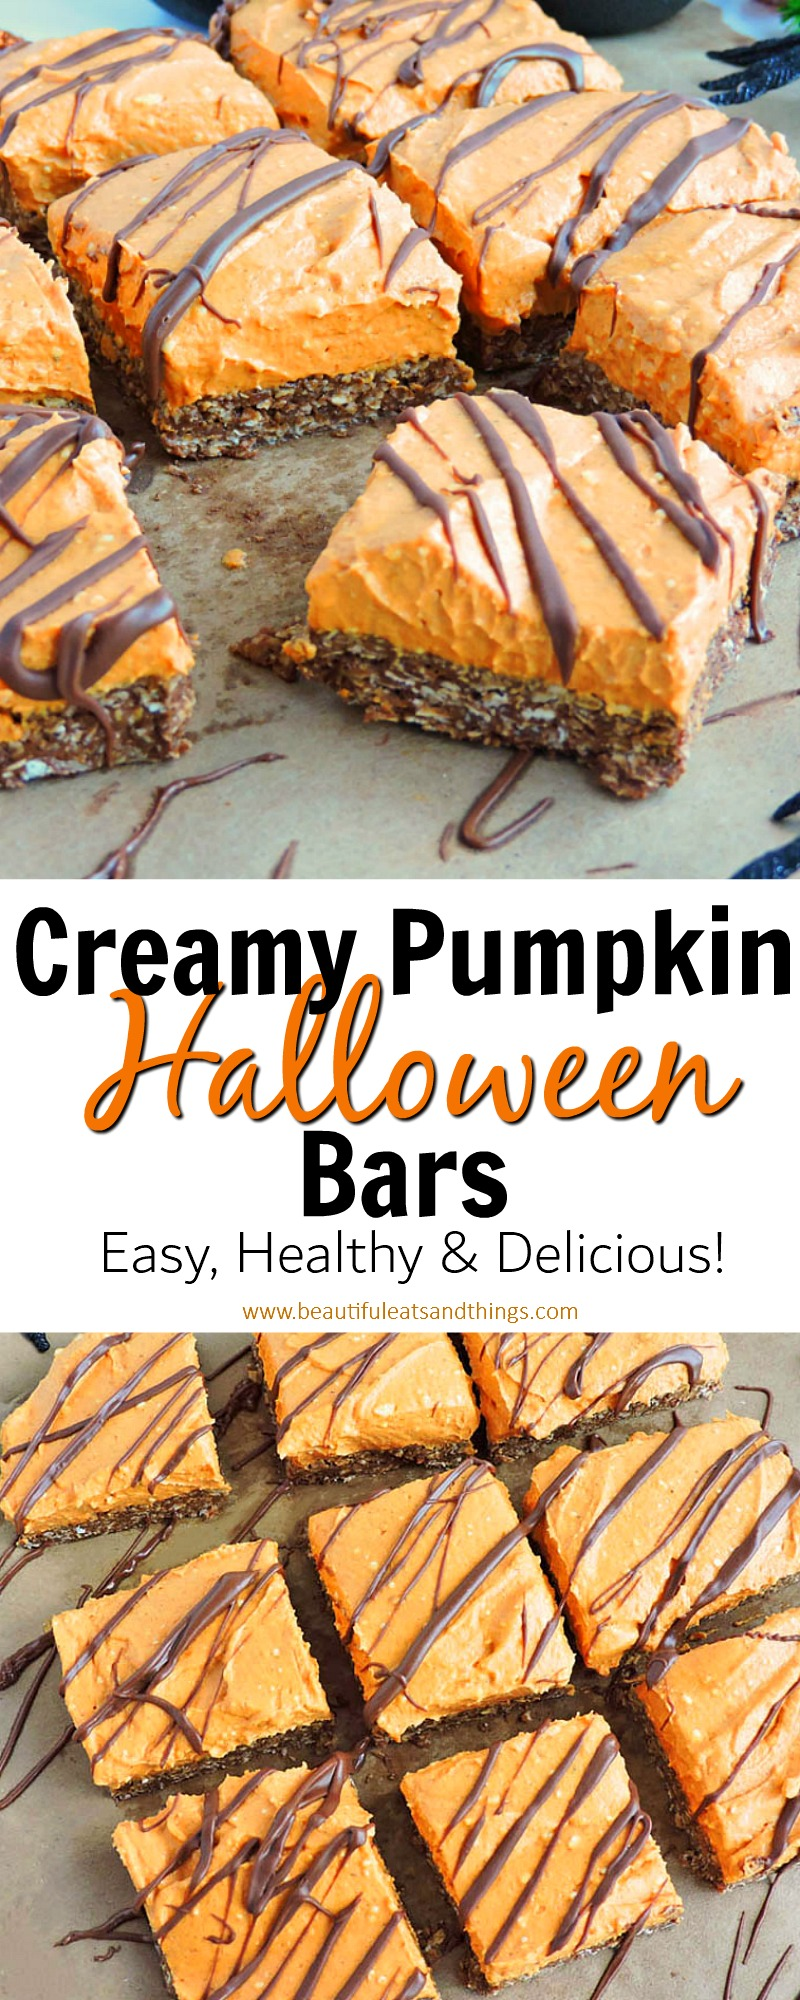 Creamy Pumpkin Chocoalte Granola Bars-Orange pumpkin bars drizzled with chocolate making these the perfect Halloween bars